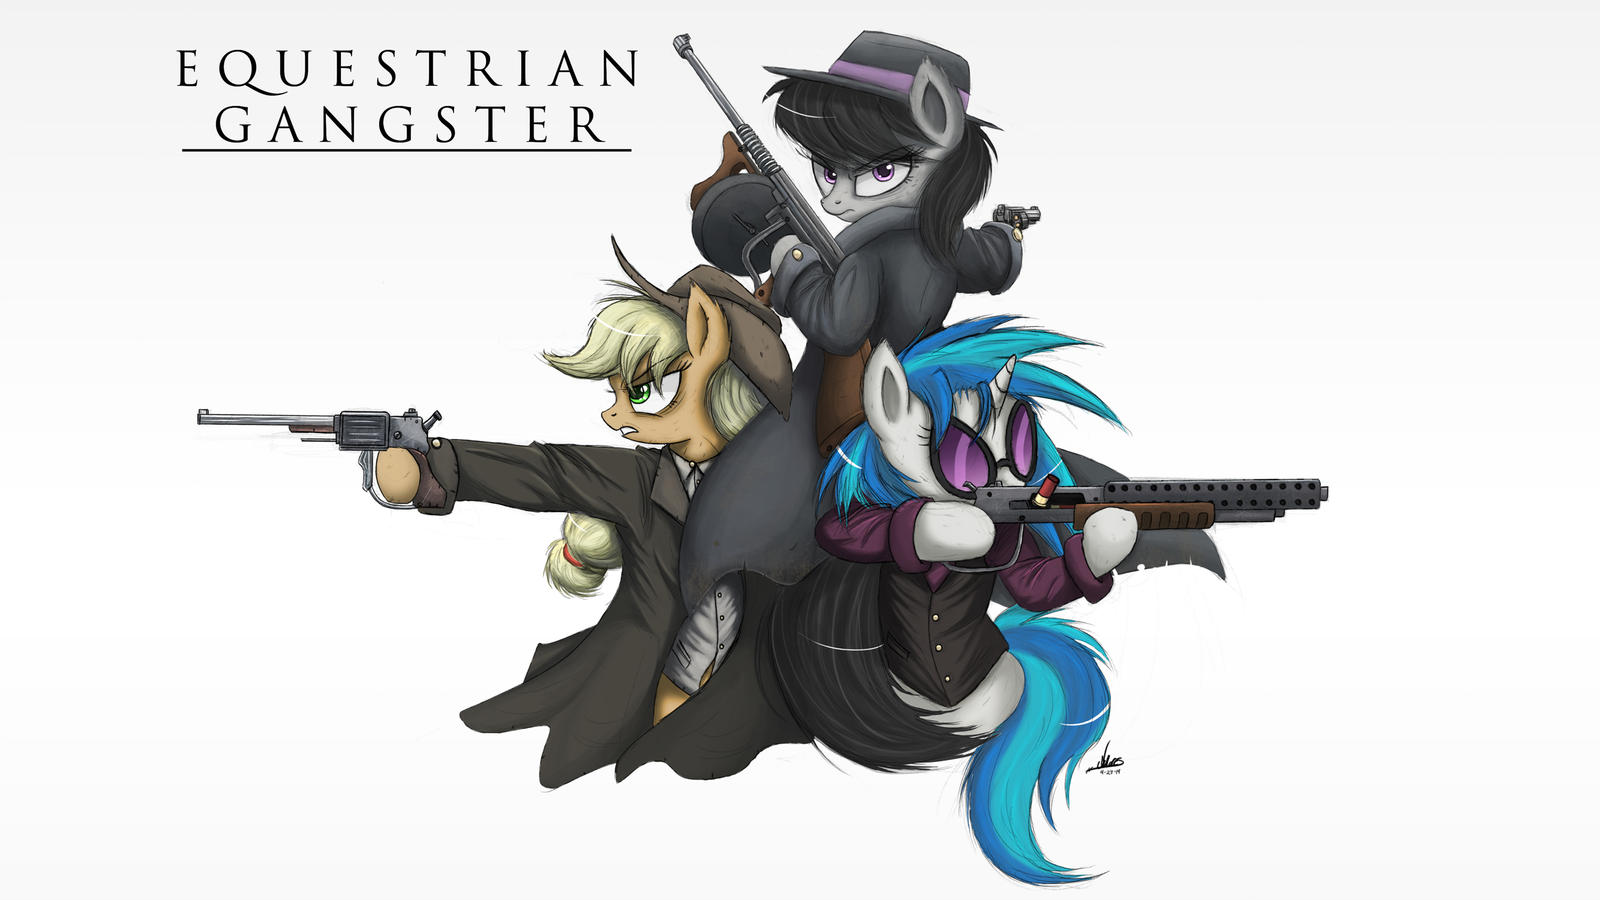 Equestrian Gangster